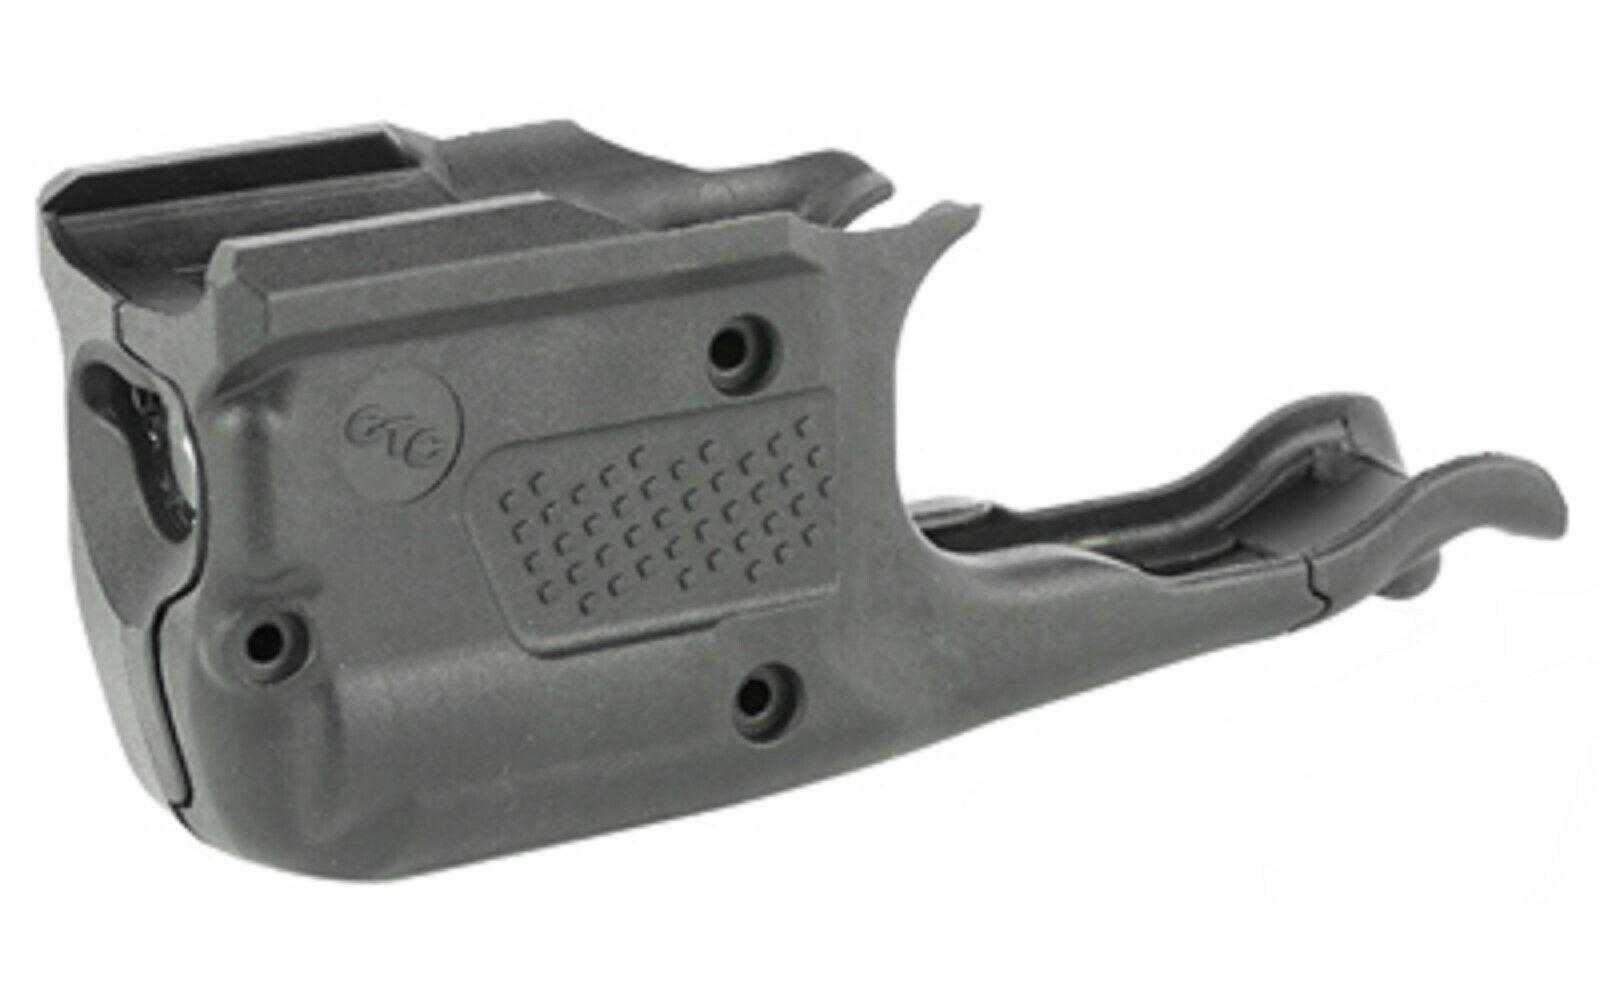 CTC laserguard Pro para GLK 17 19 GRN LL-807G